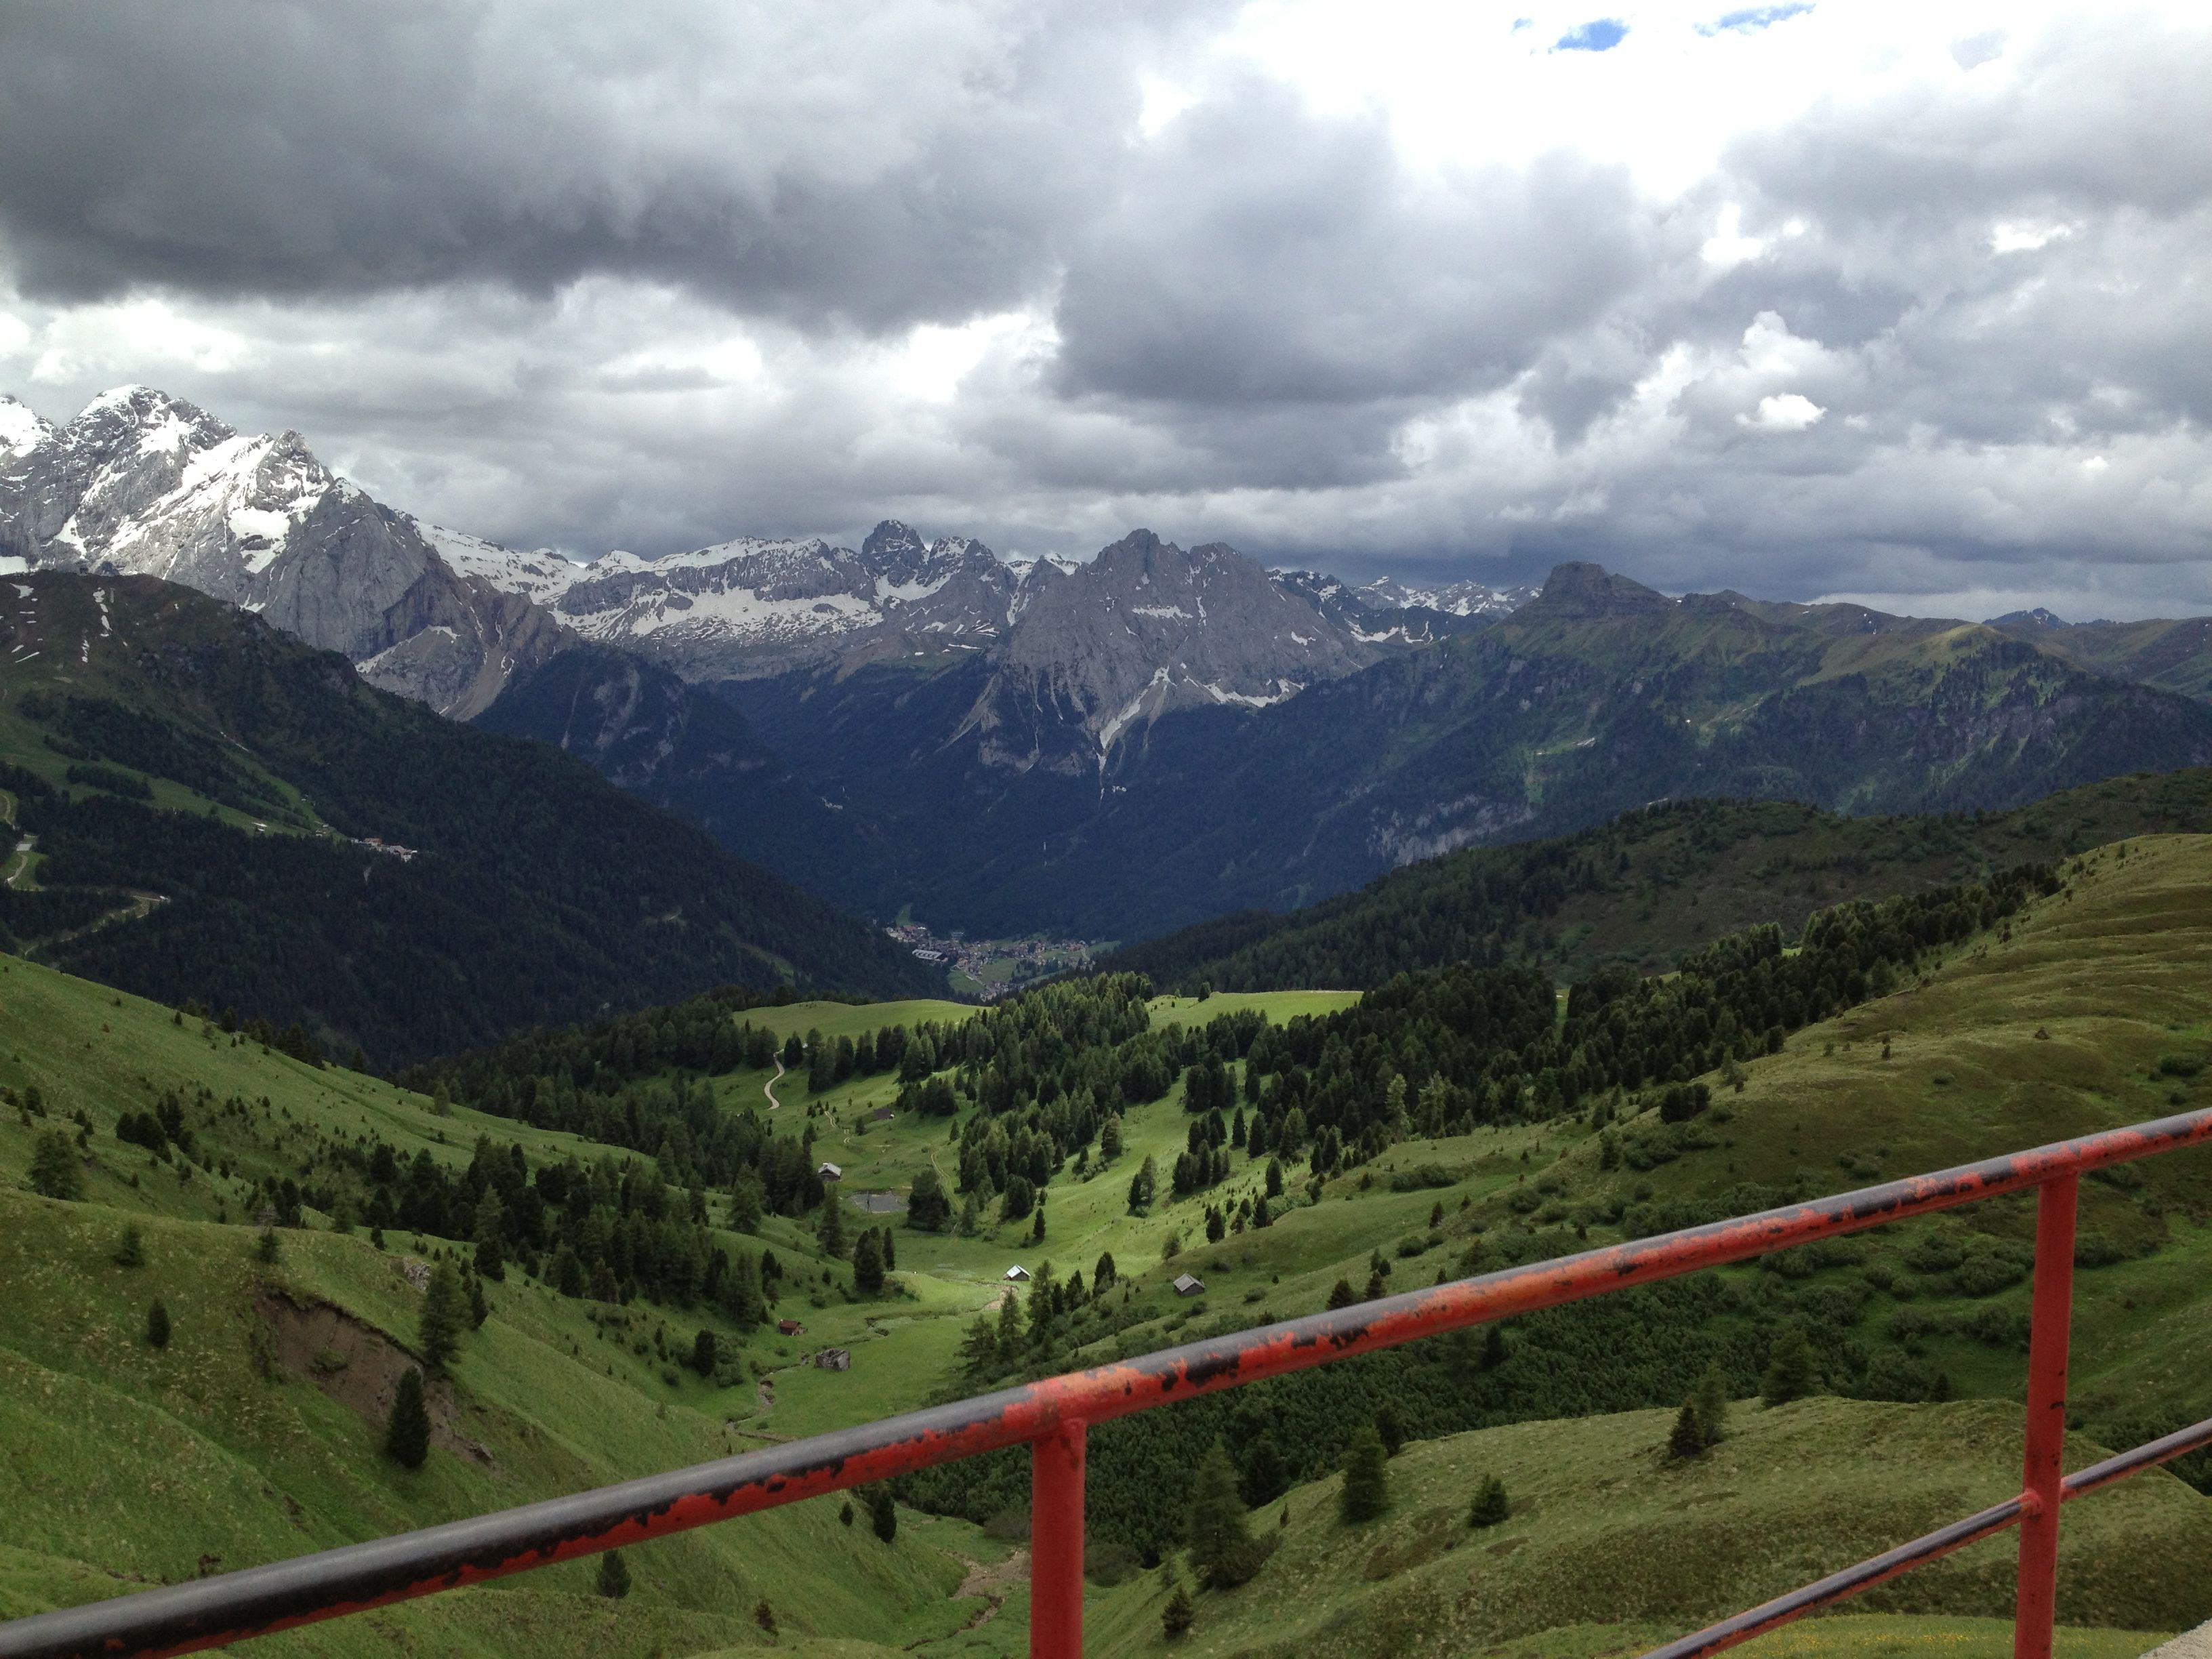 Near Bolzano Italy with the Dolamite Mts. in the background.